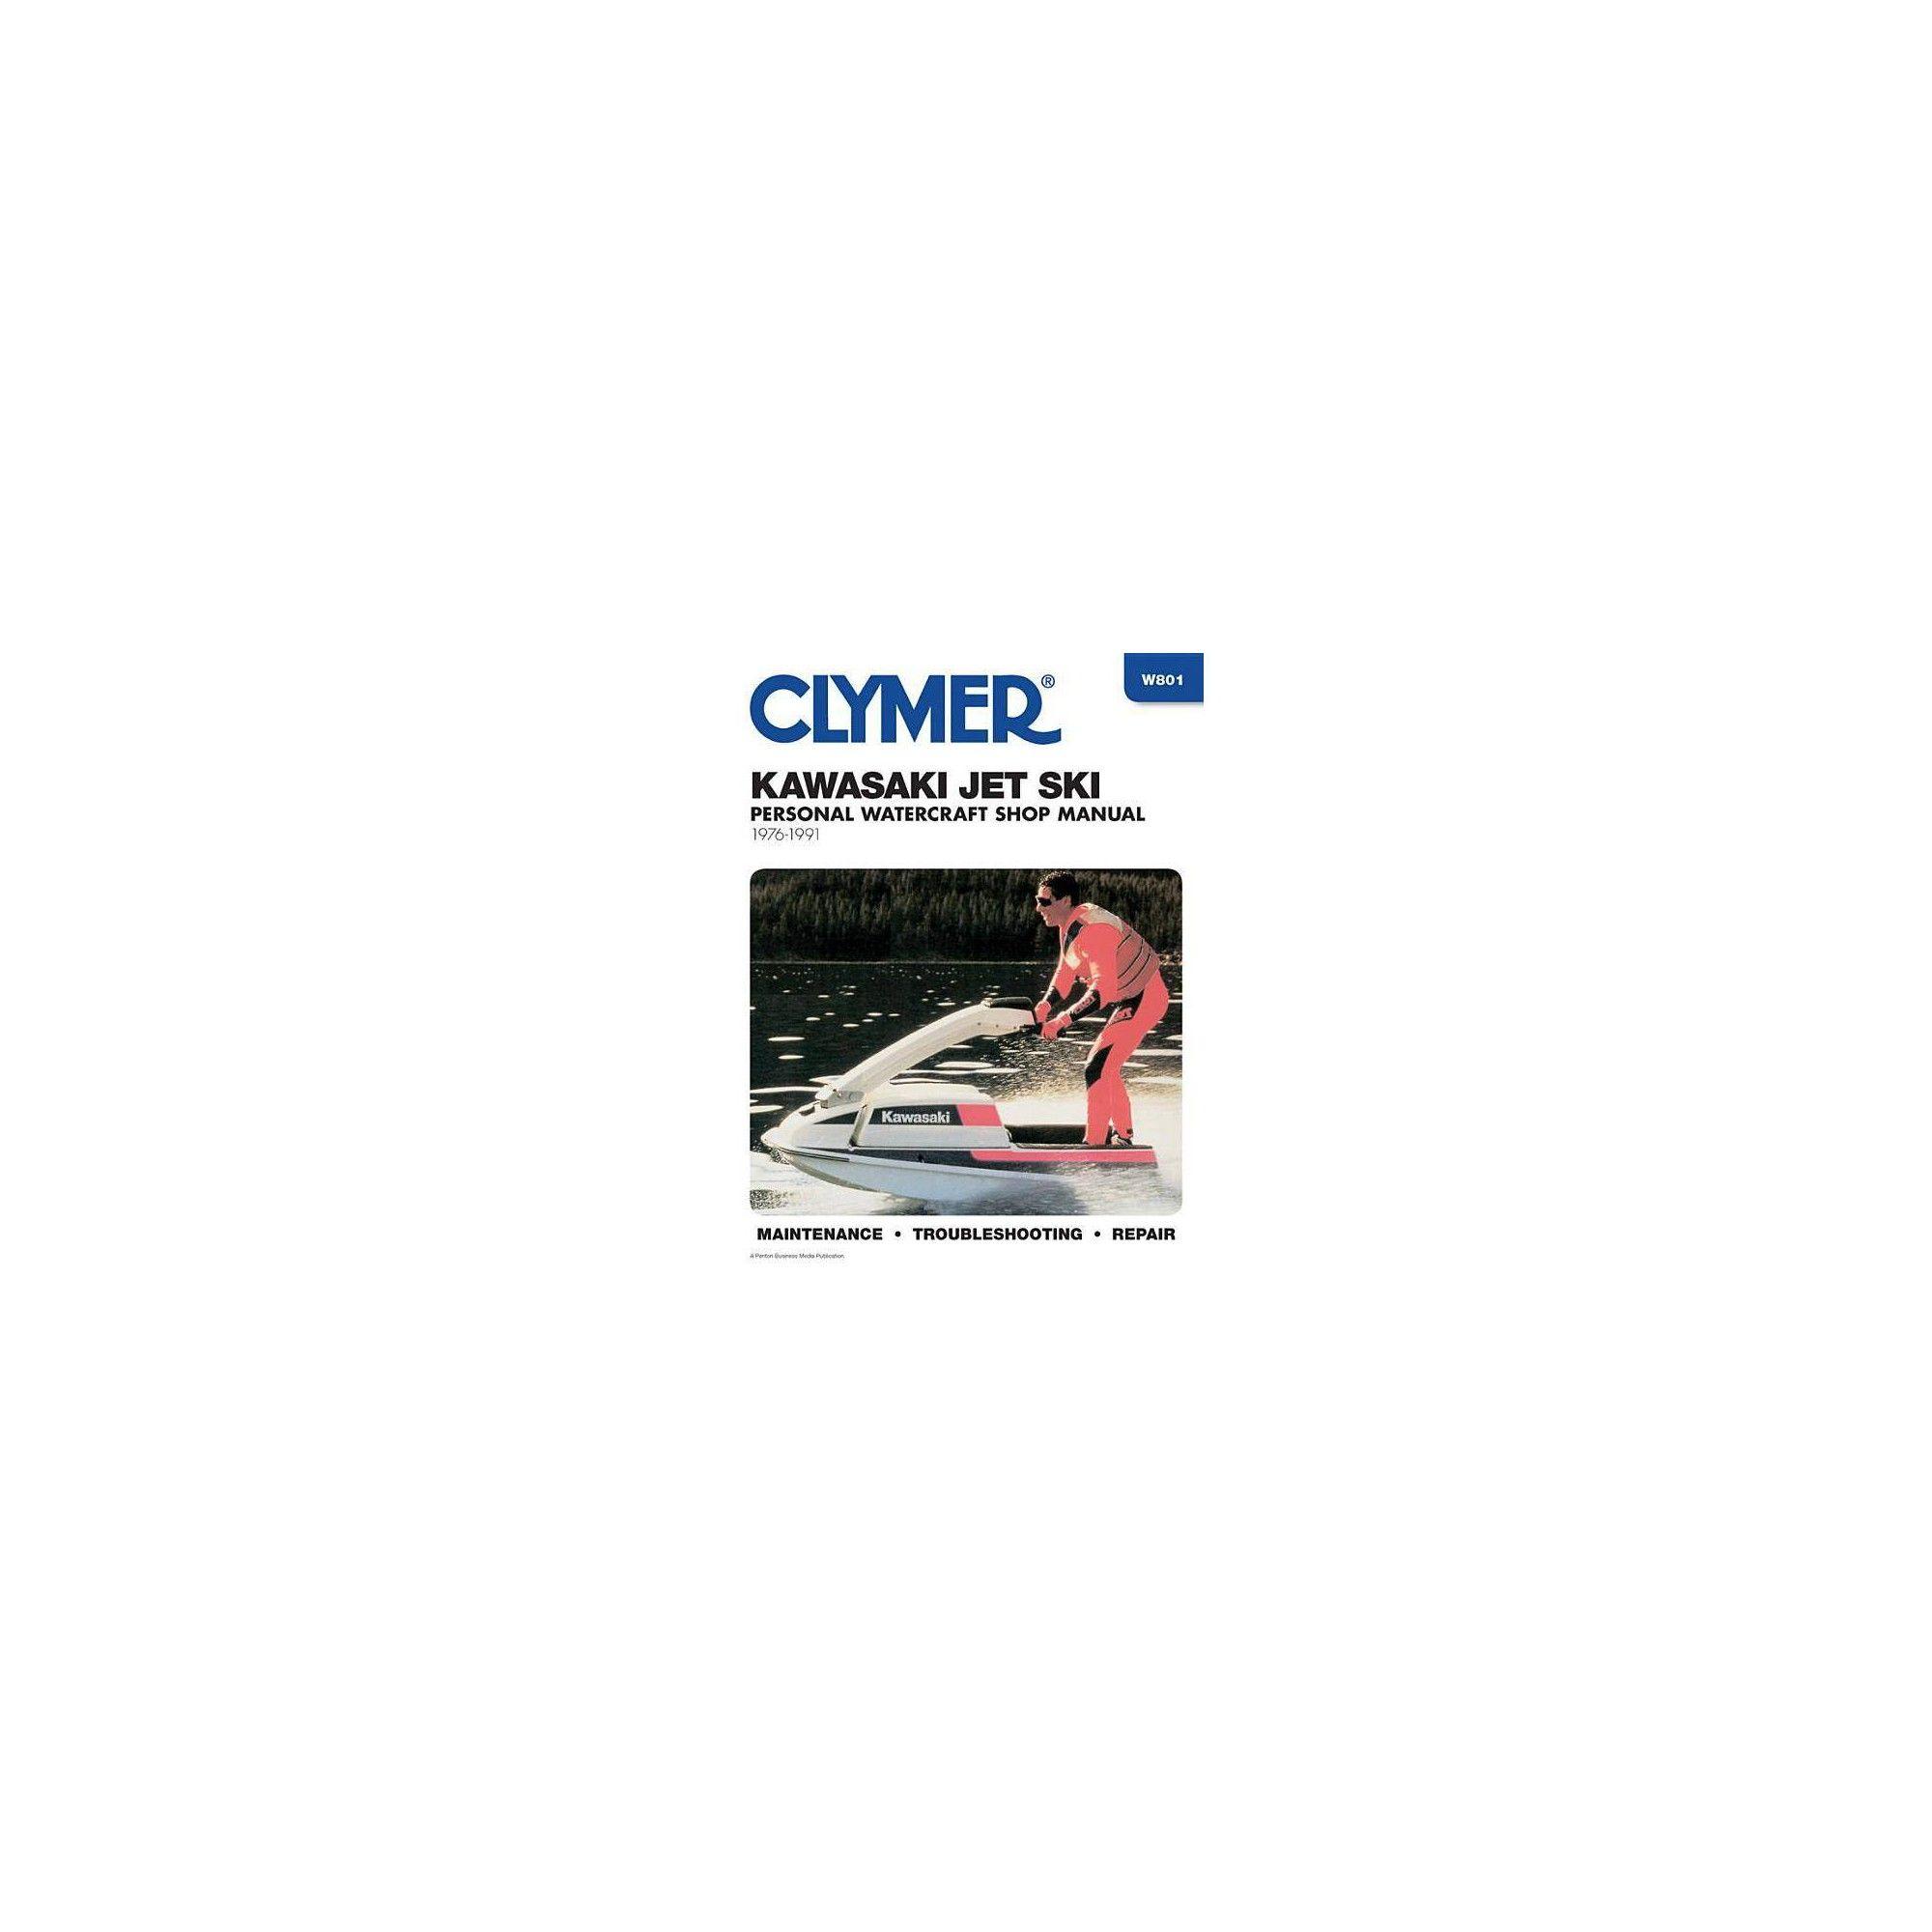 Clymer Repair Manual for Kawasaki Jet Ski 1976-1991 Automotive ...